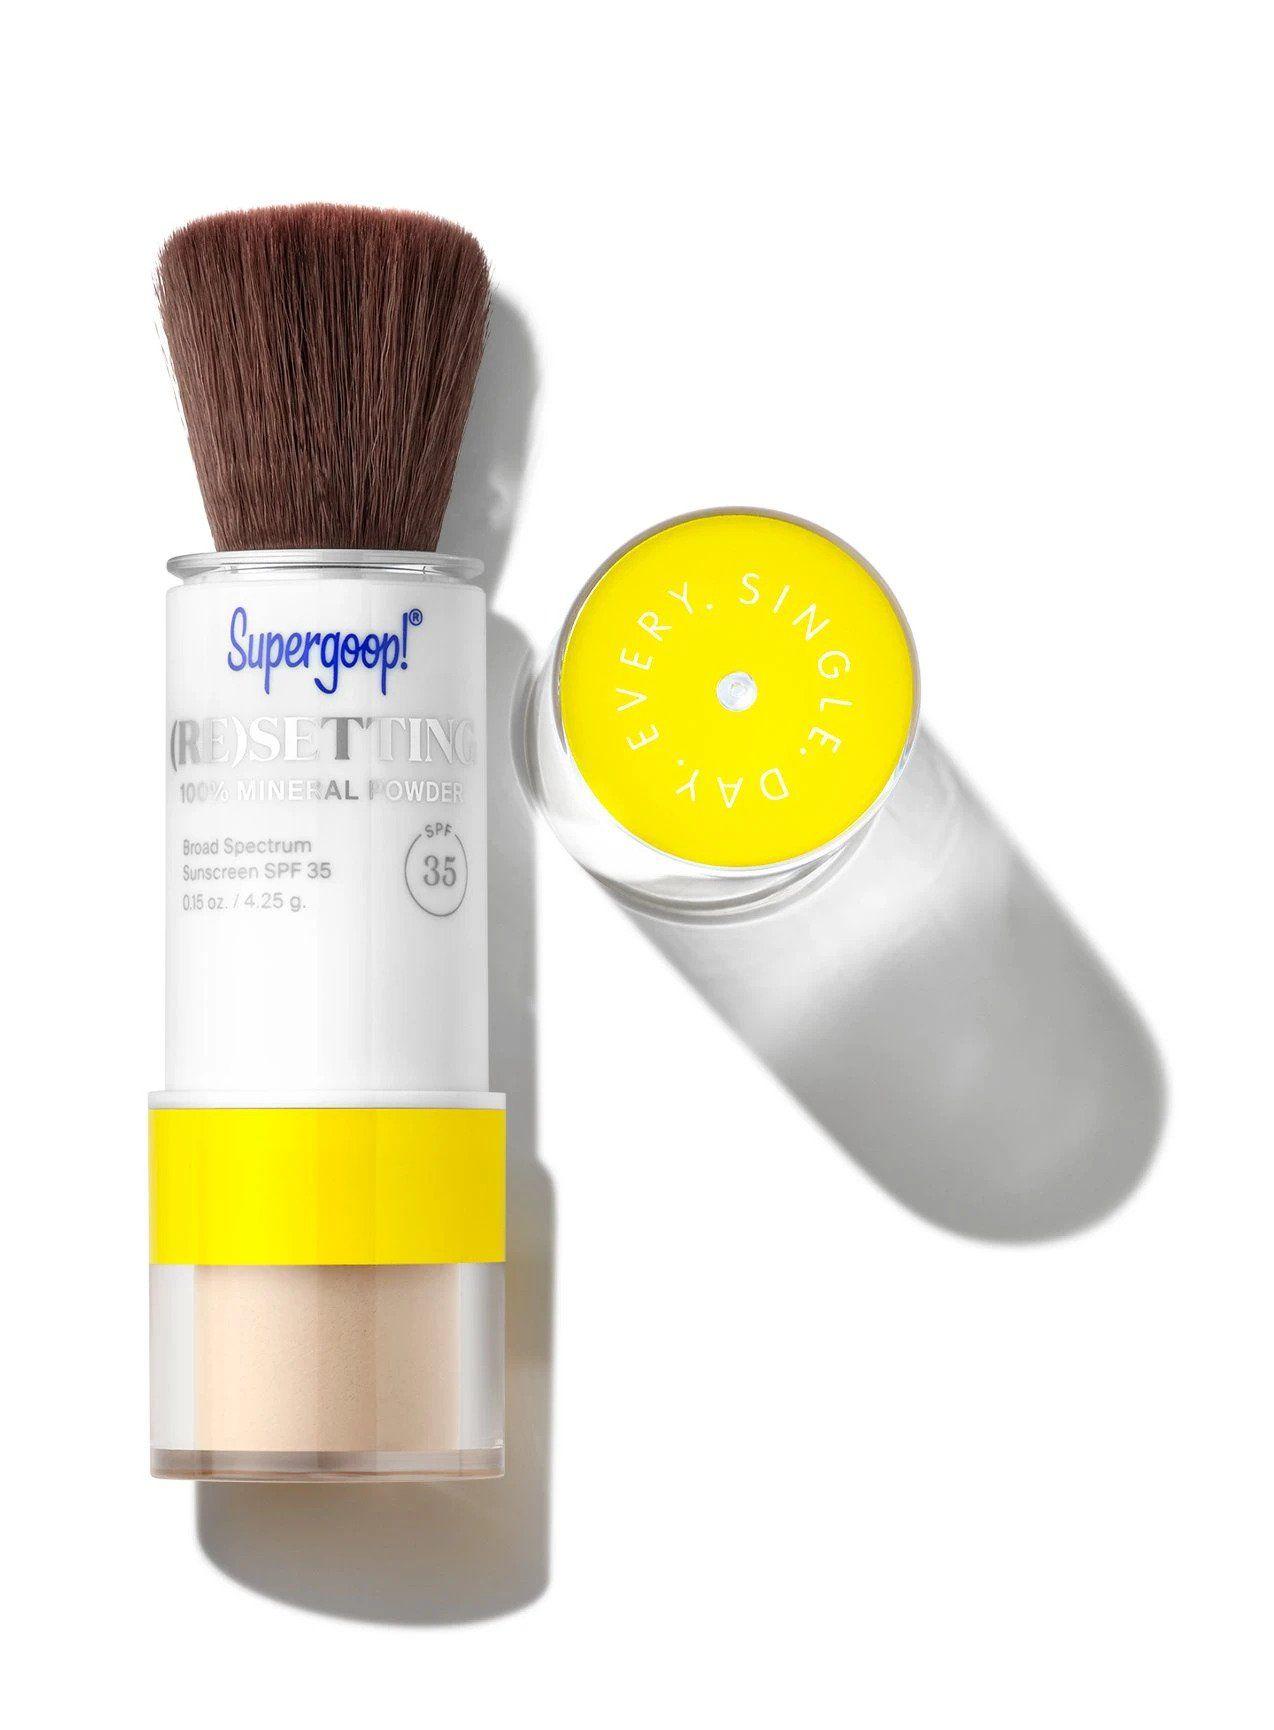 Supergoop Re(setting) SPF powder